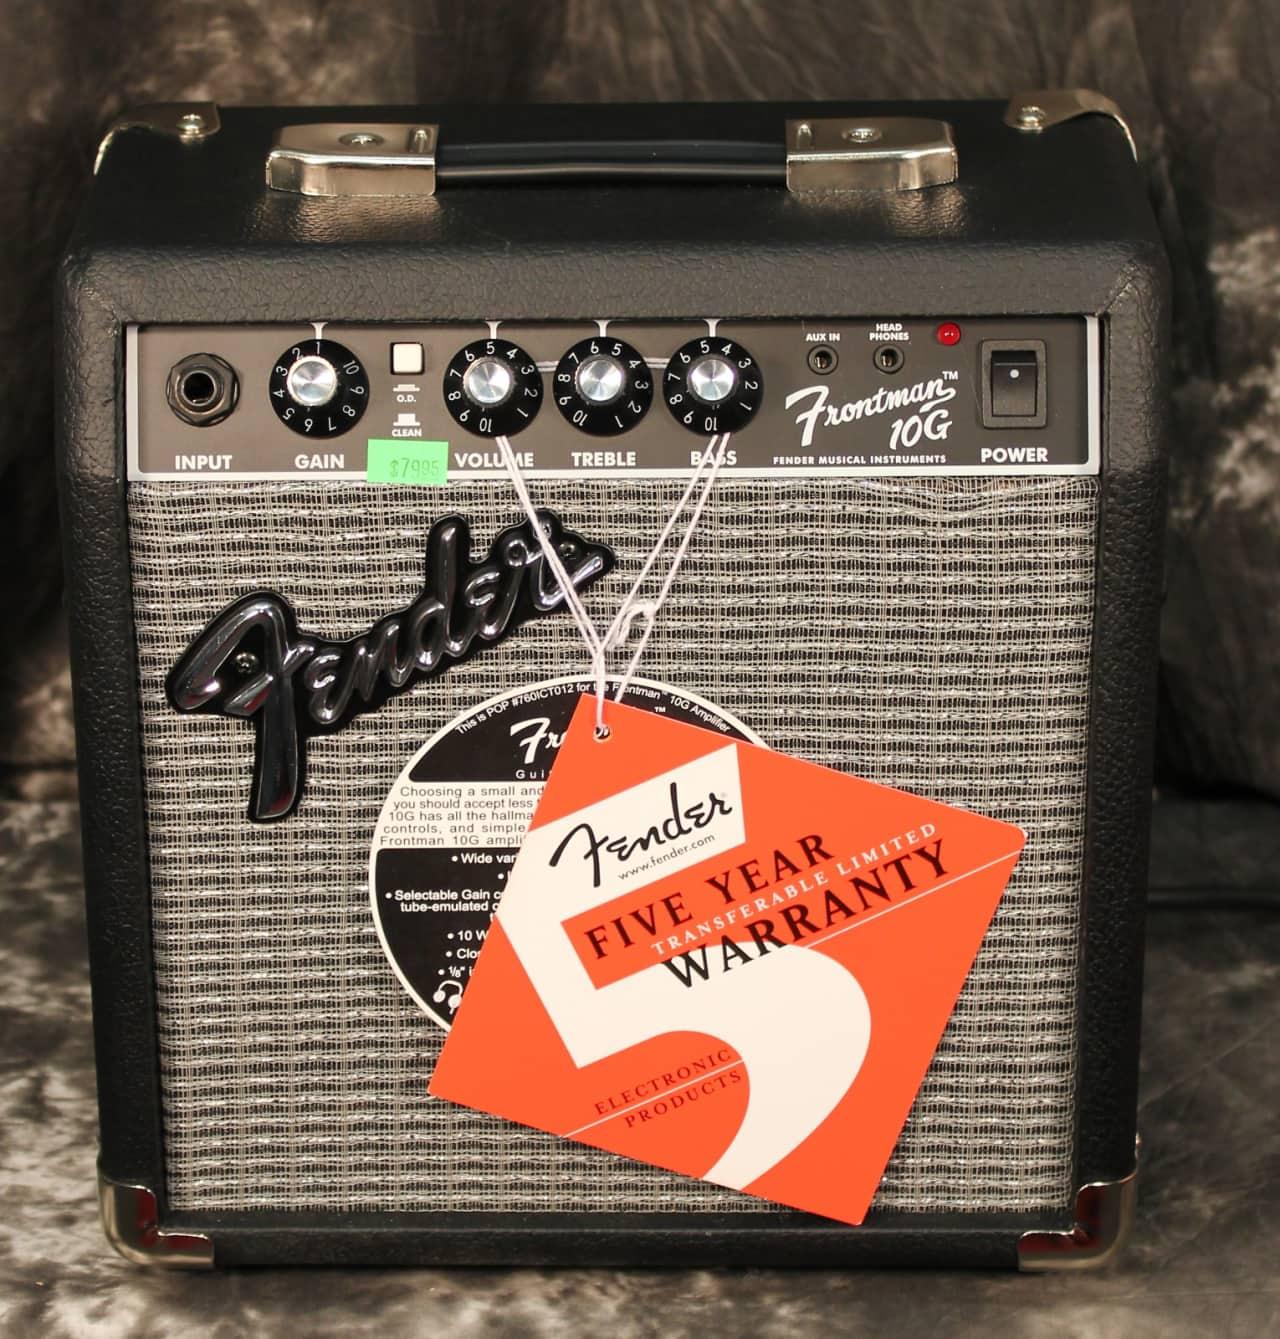 fender frontman 10g 10w electric guitar combo amplifier reverb. Black Bedroom Furniture Sets. Home Design Ideas